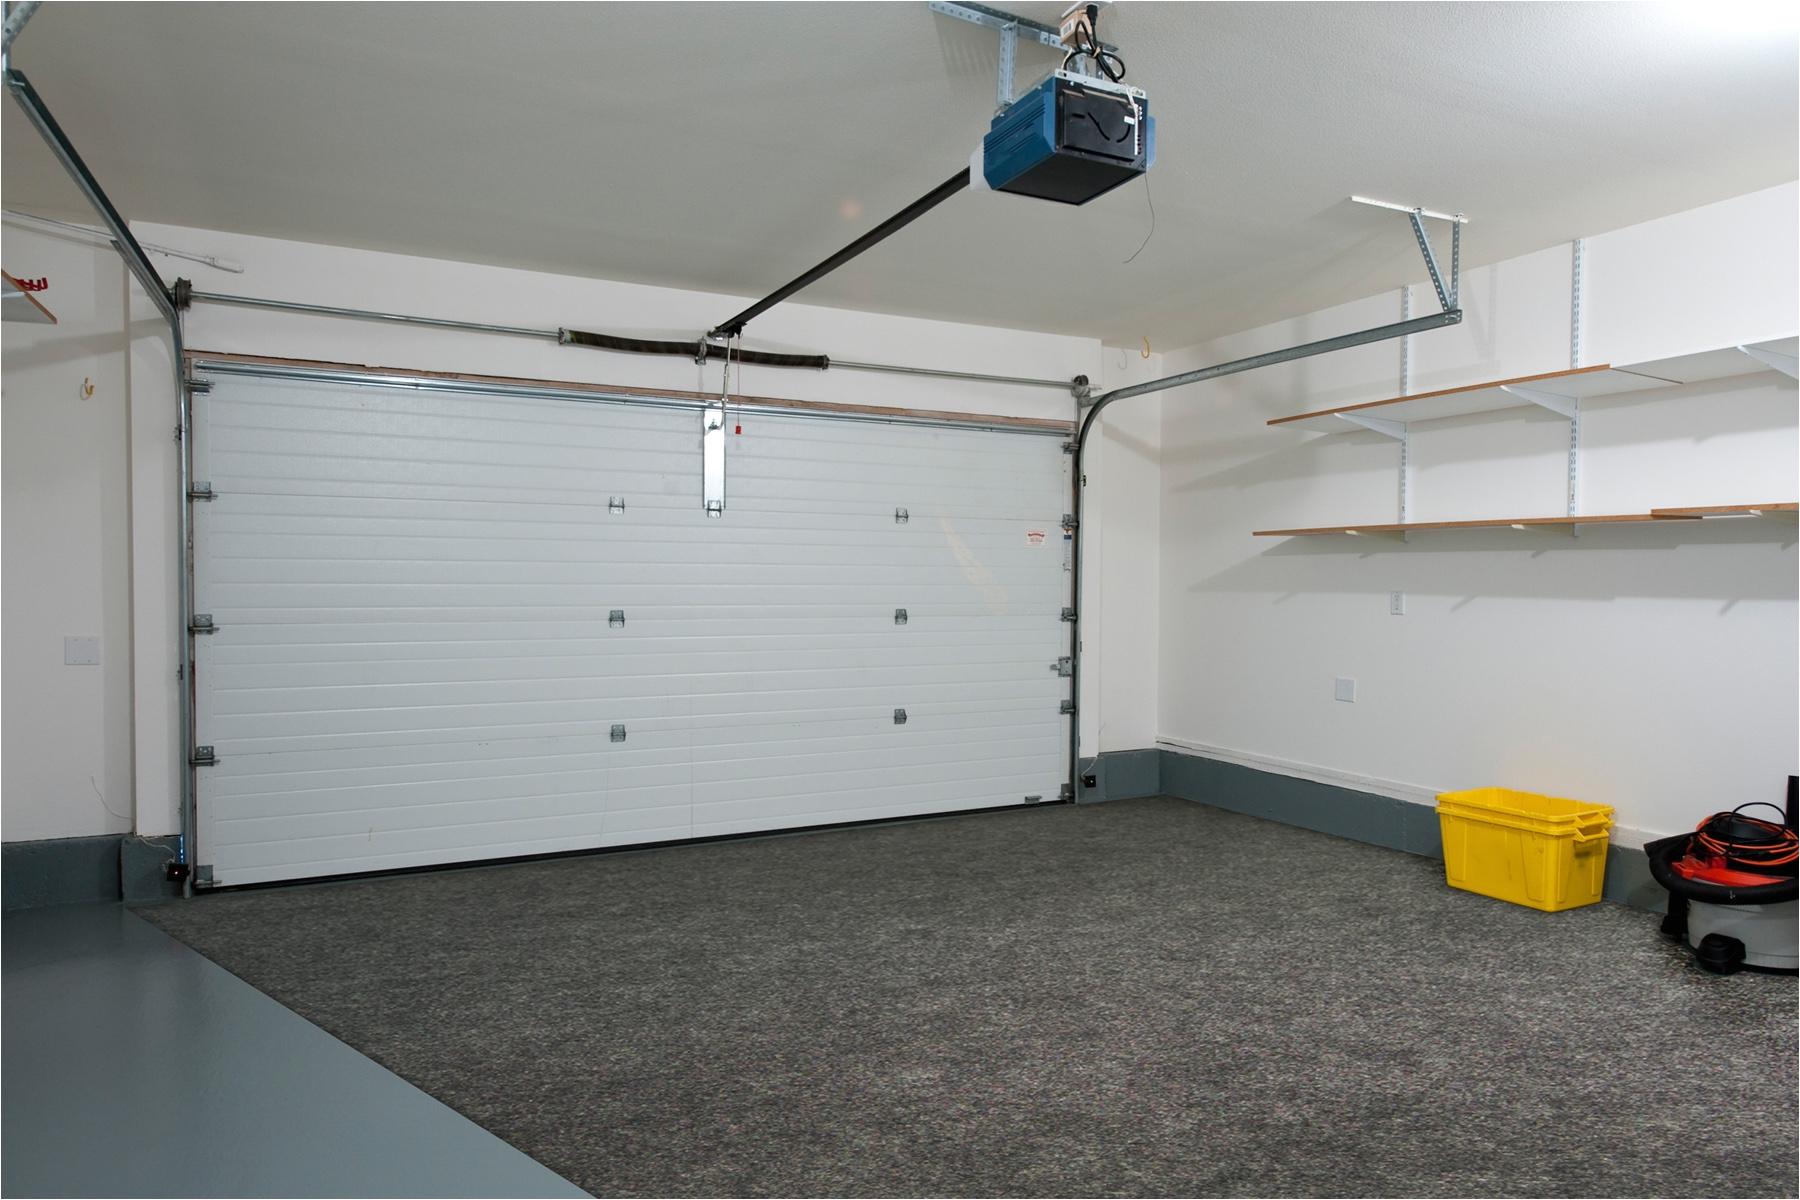 Rubbermaid Garage Floor Mats Armor All Garage Floor Mat Armor All Mats